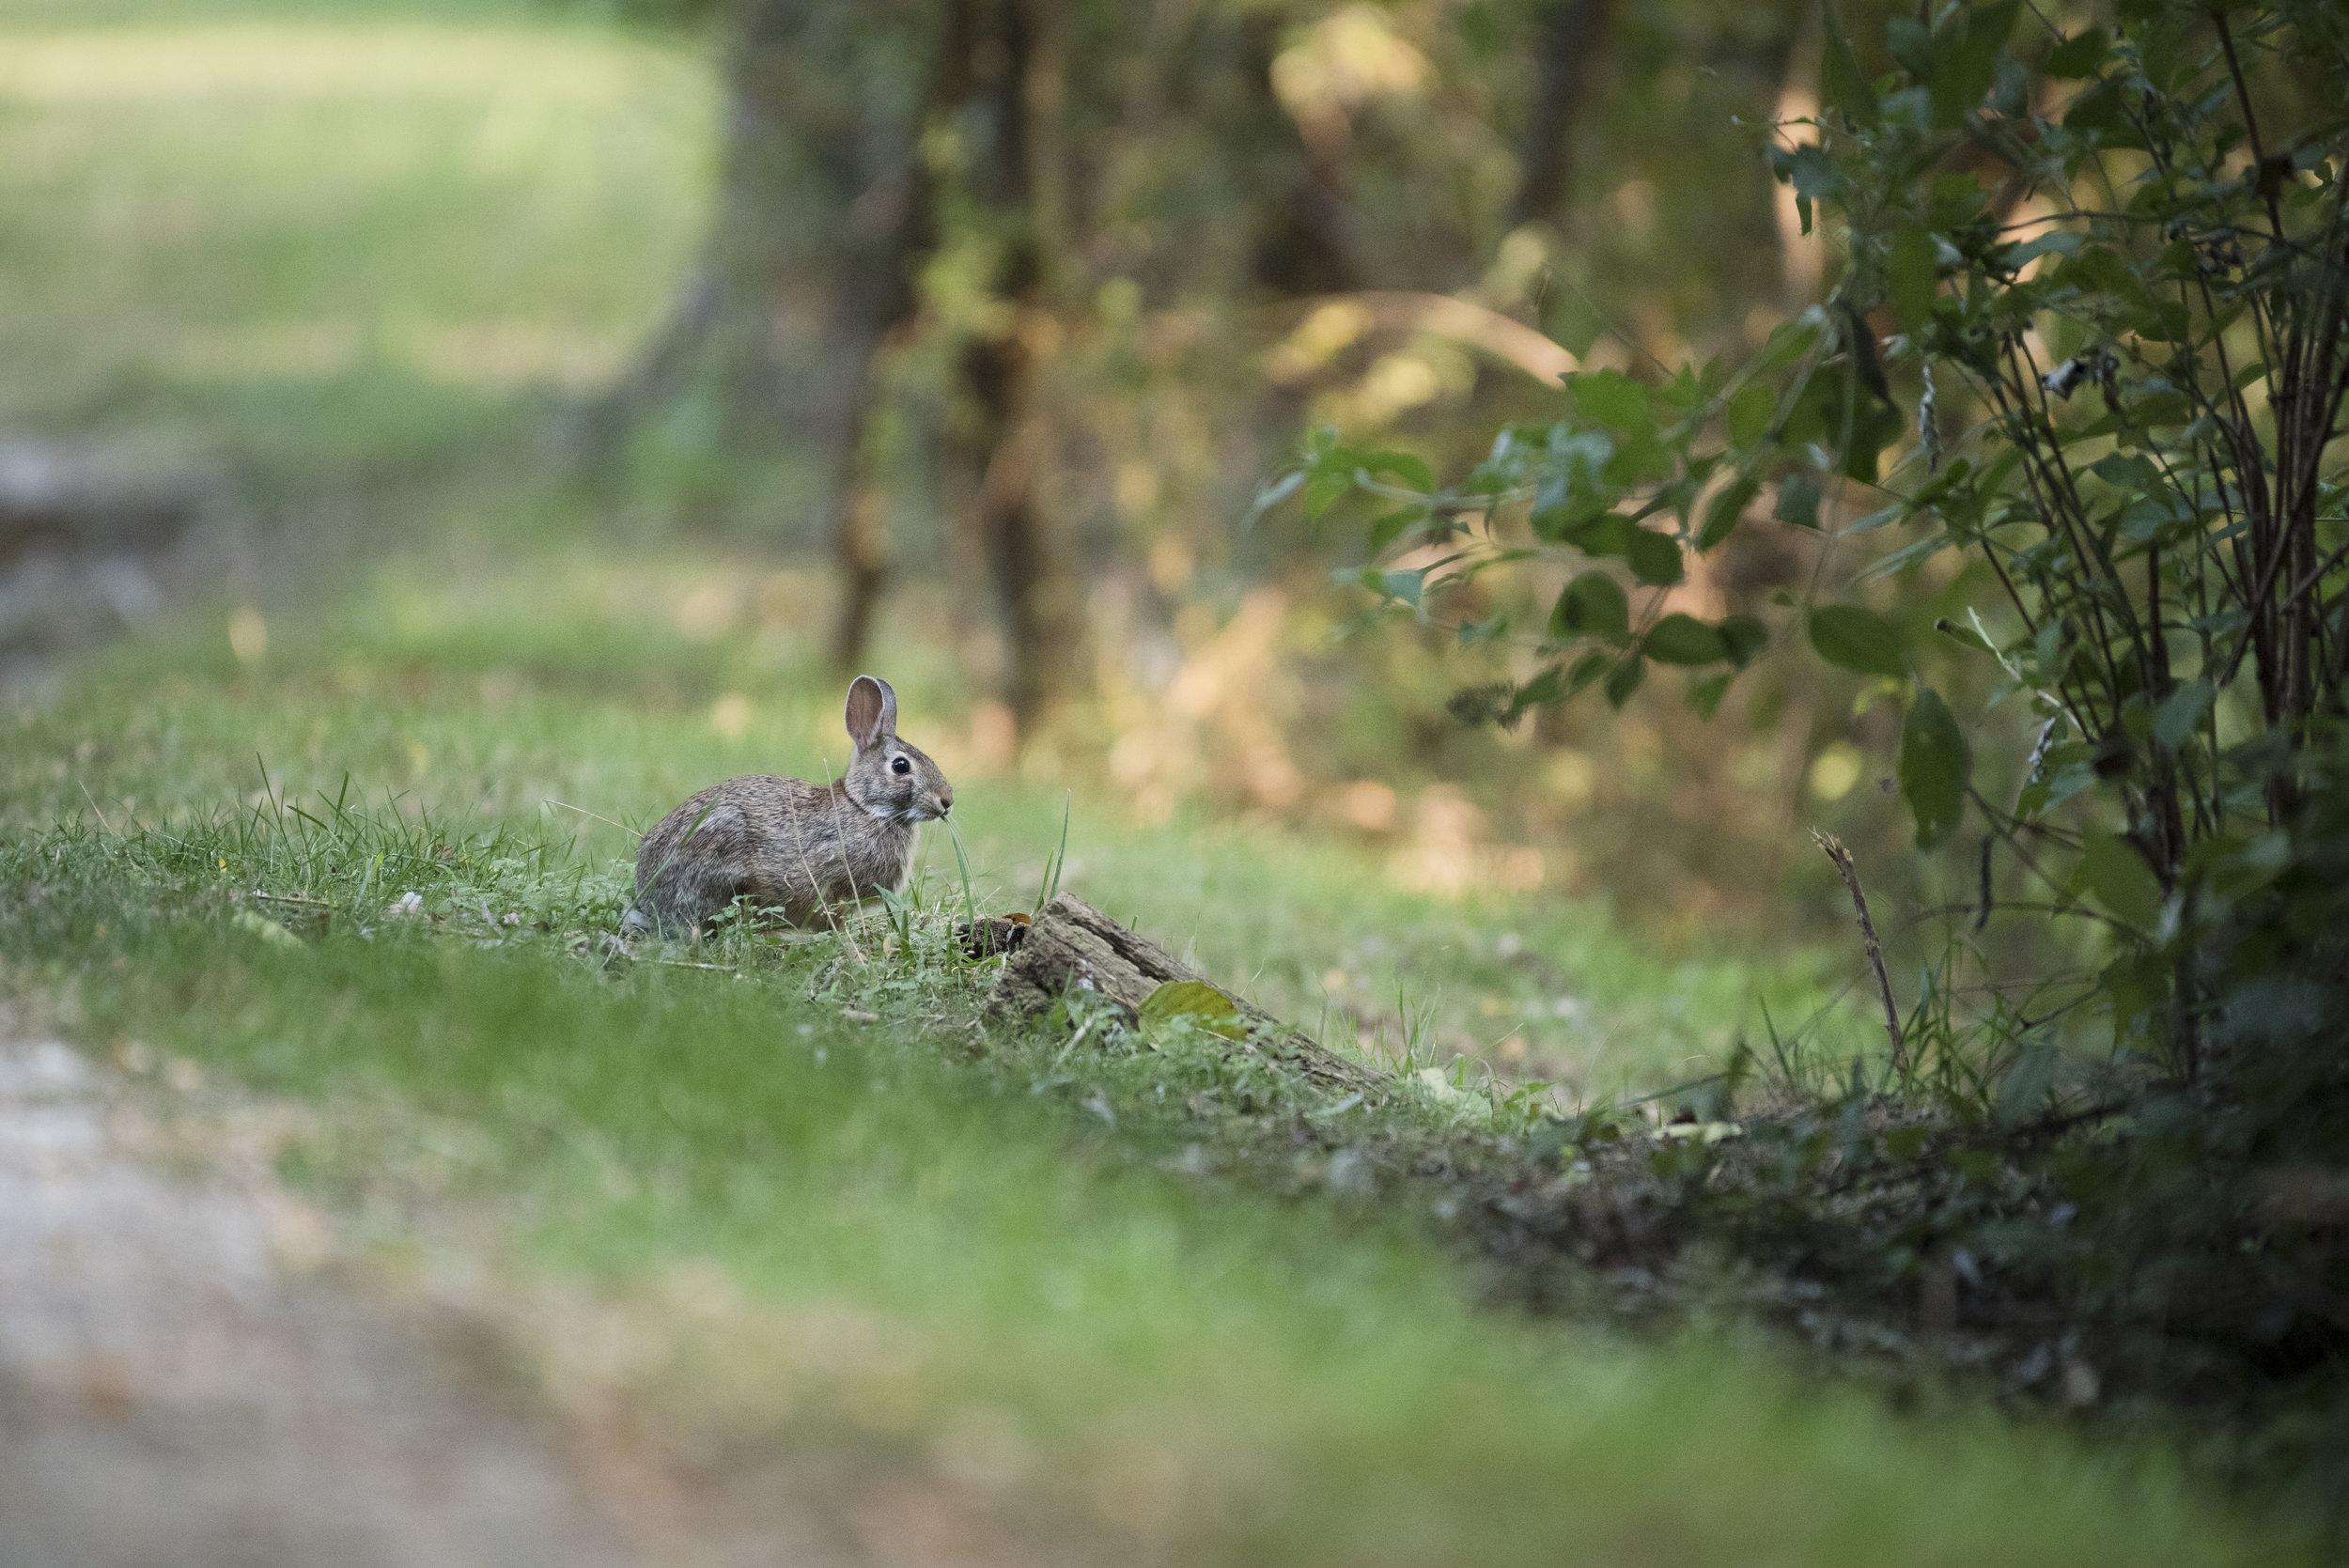 Rabbit of Natural Reserve